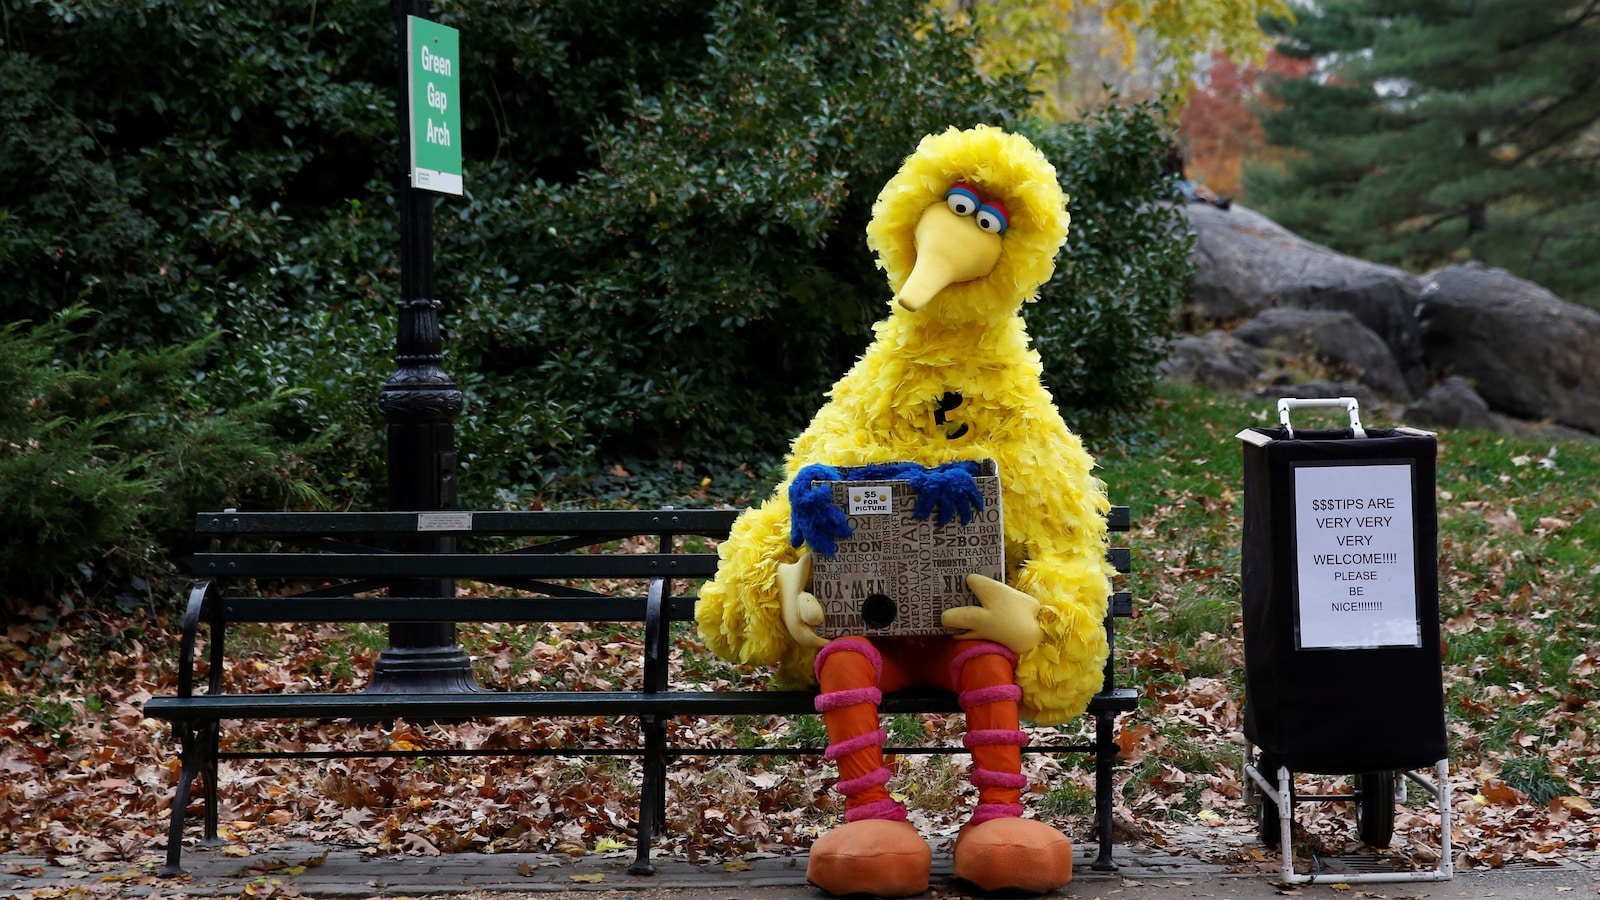 Big bird dans Central park